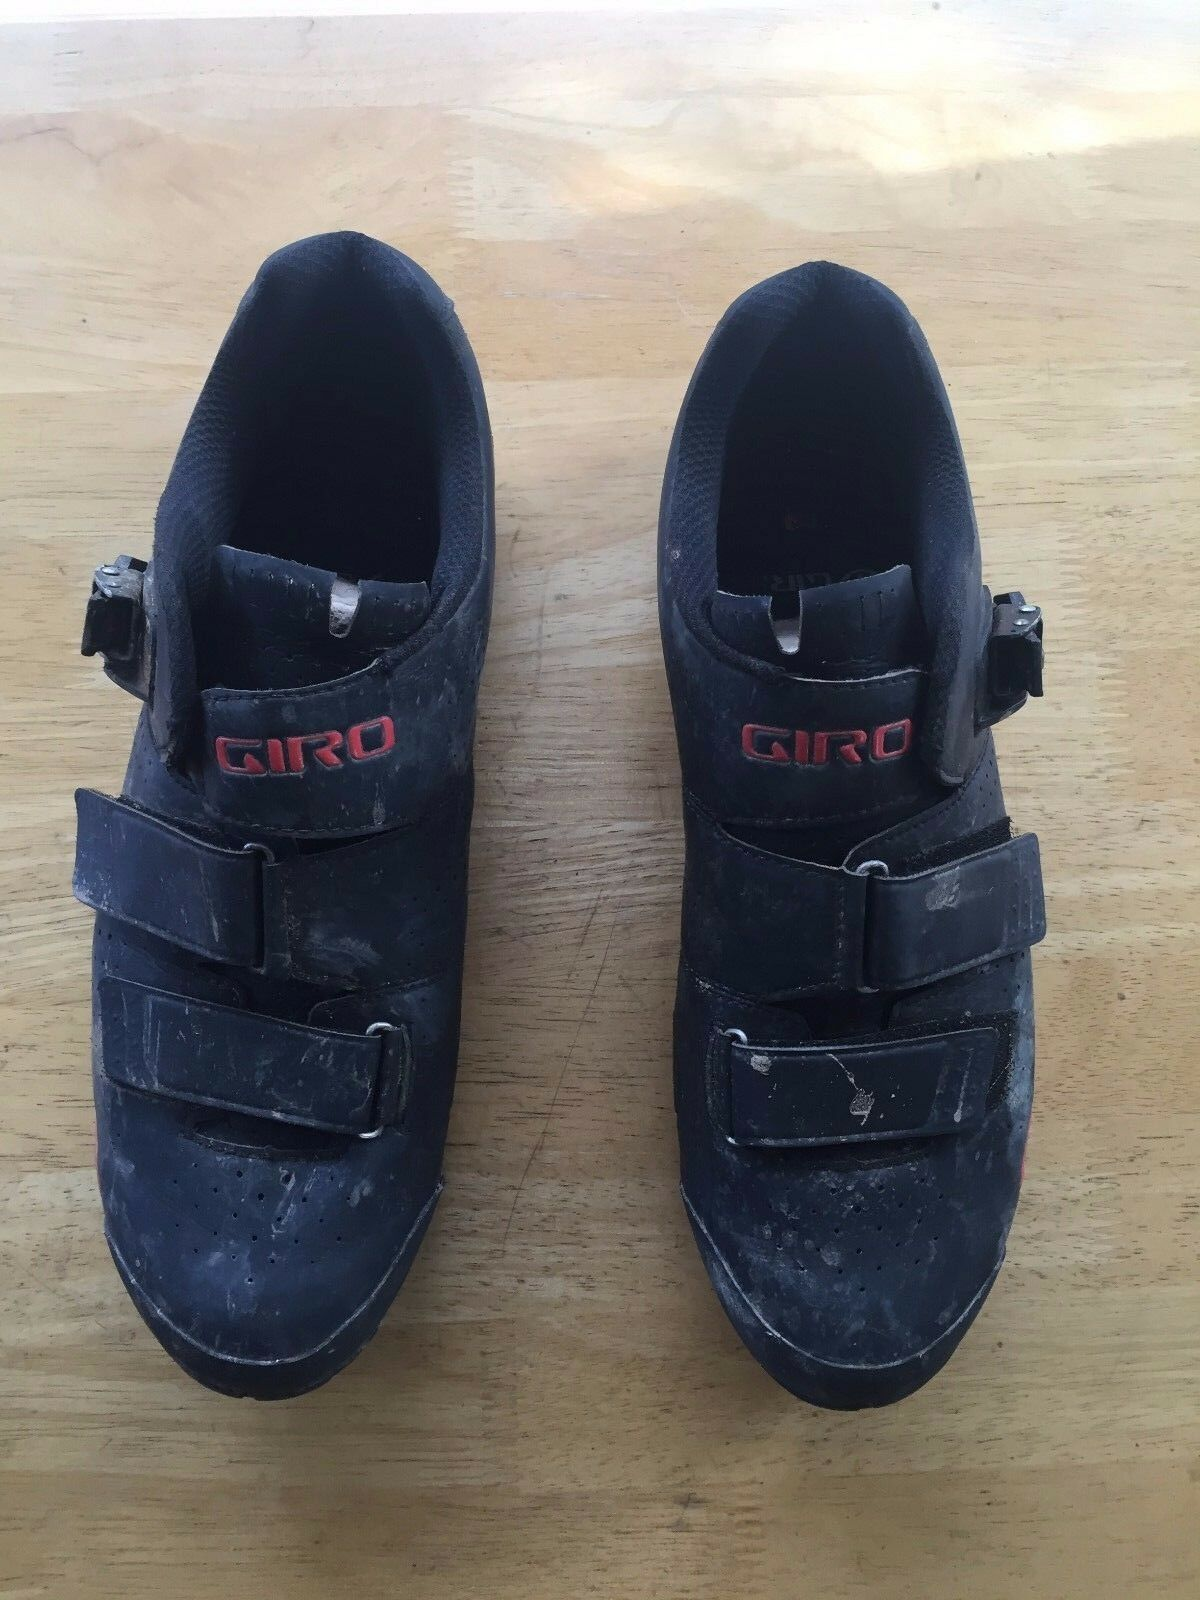 Giro  Code VR70 Men's MTB shoes 48  wholesale